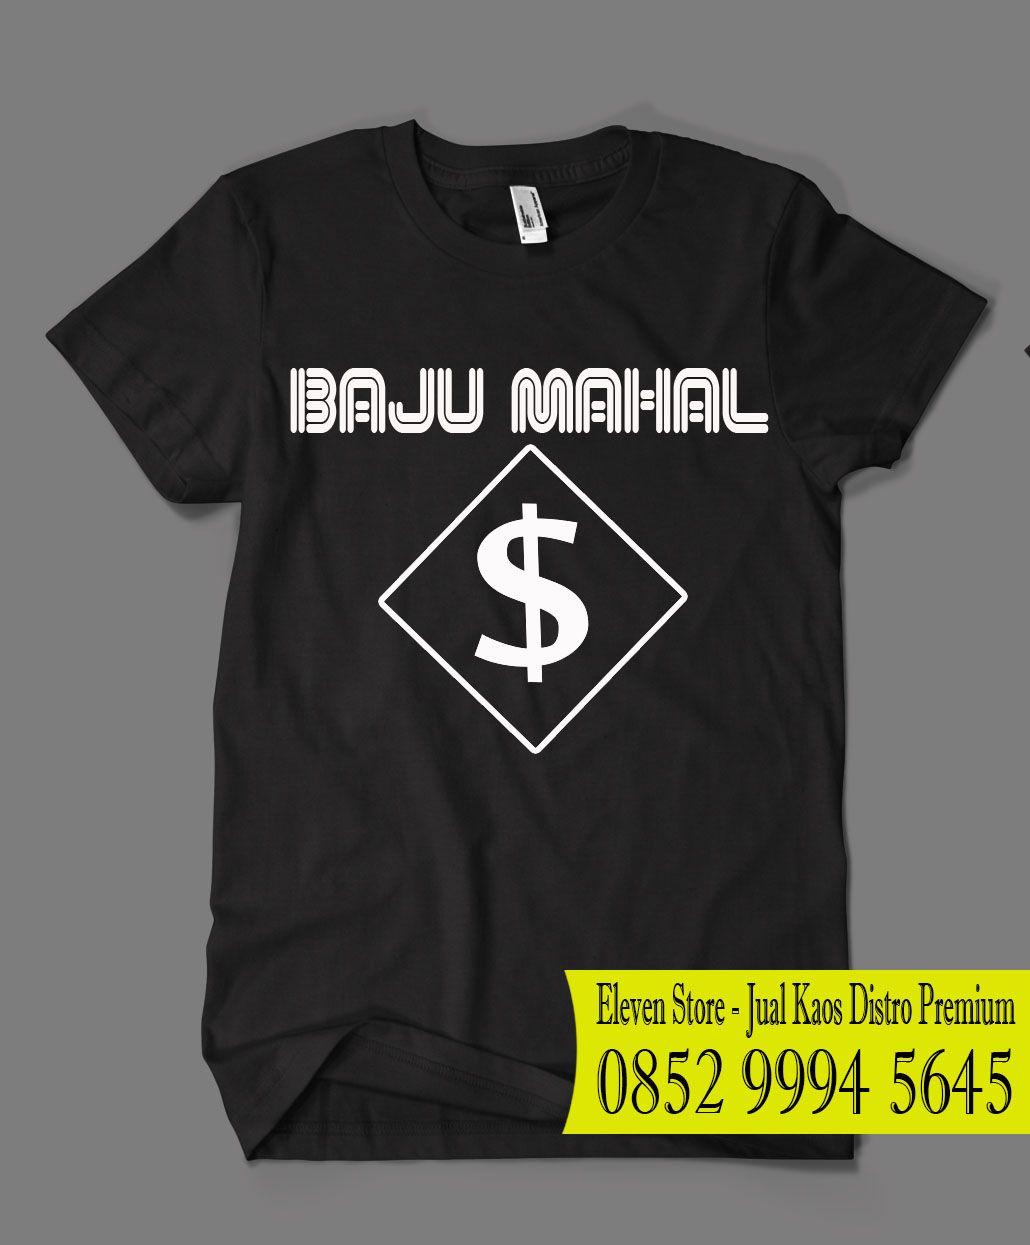 Baju Mahal